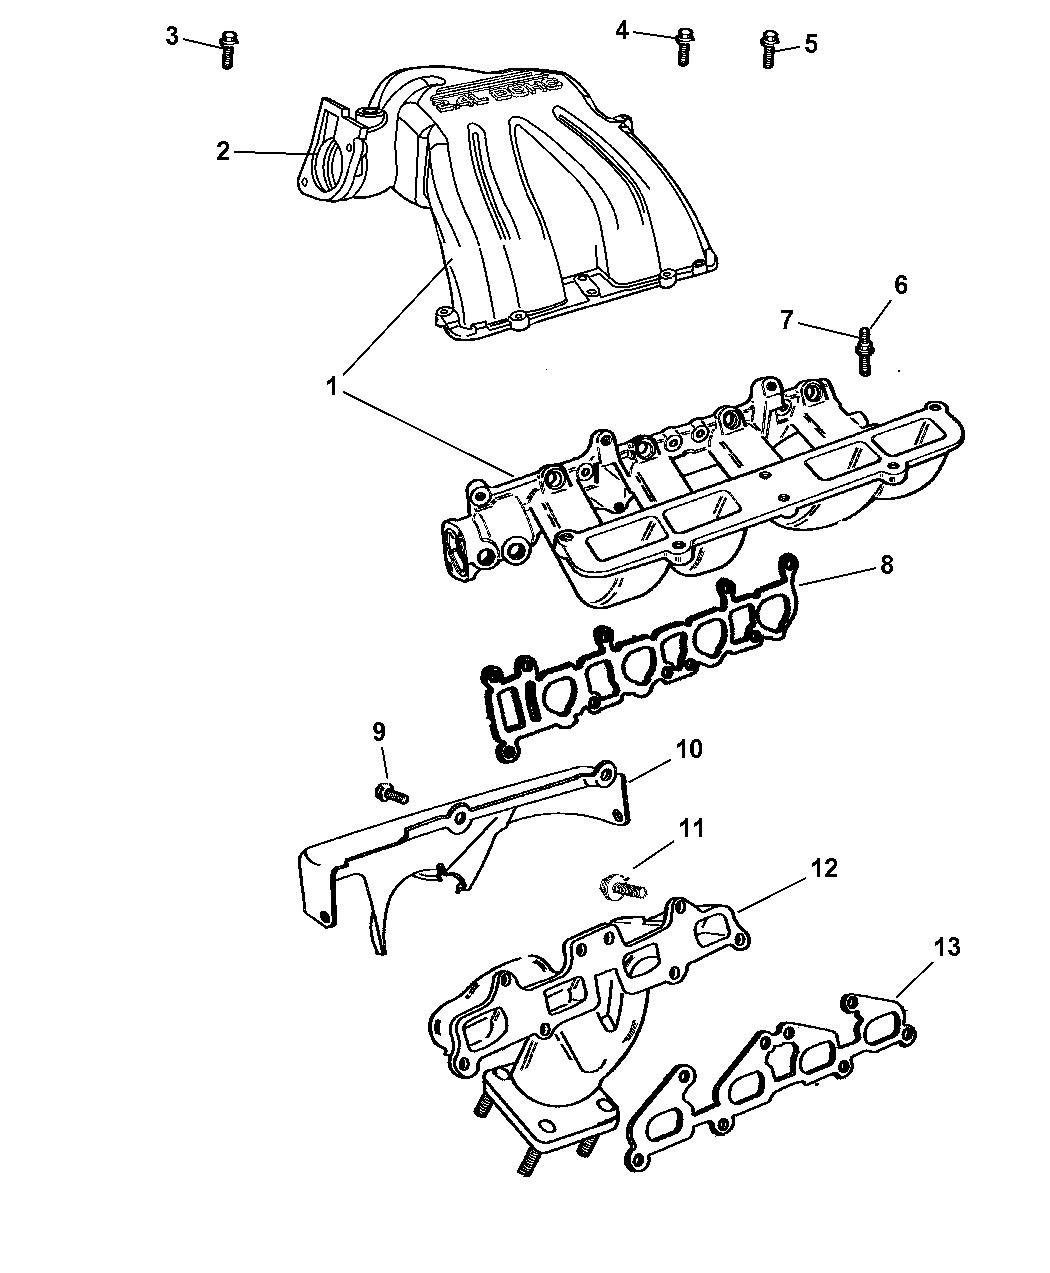 Bestseller: 2005 Jeep Liberty Engine Diagram